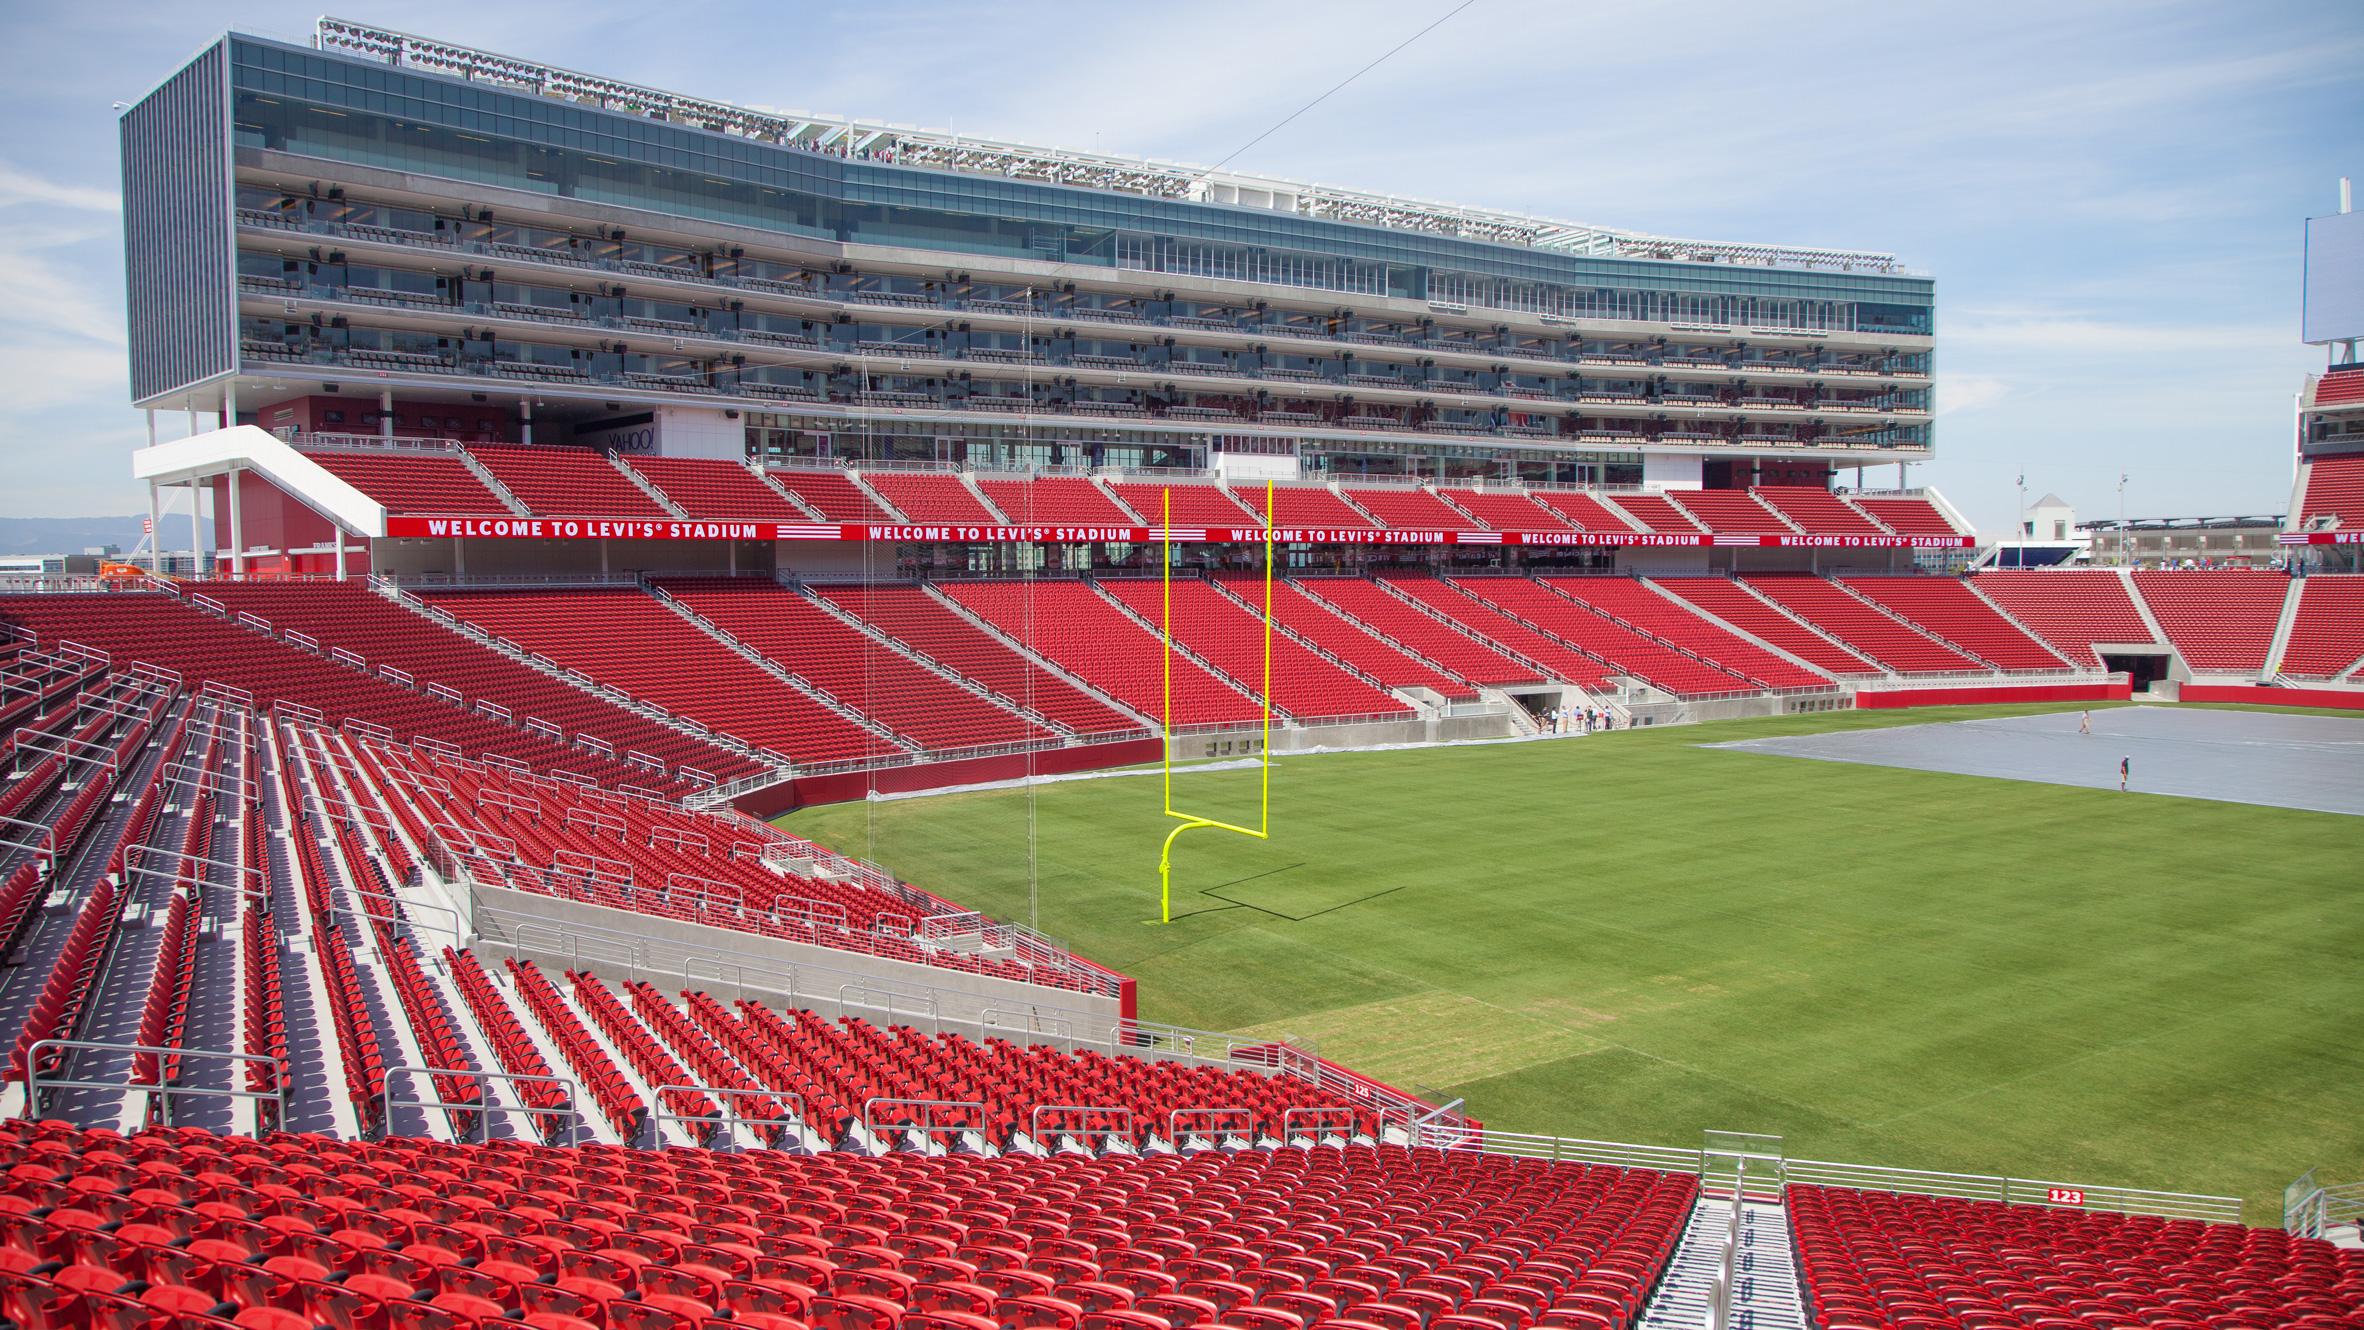 Levi's Stadium by HNTB, Santa Clara, California